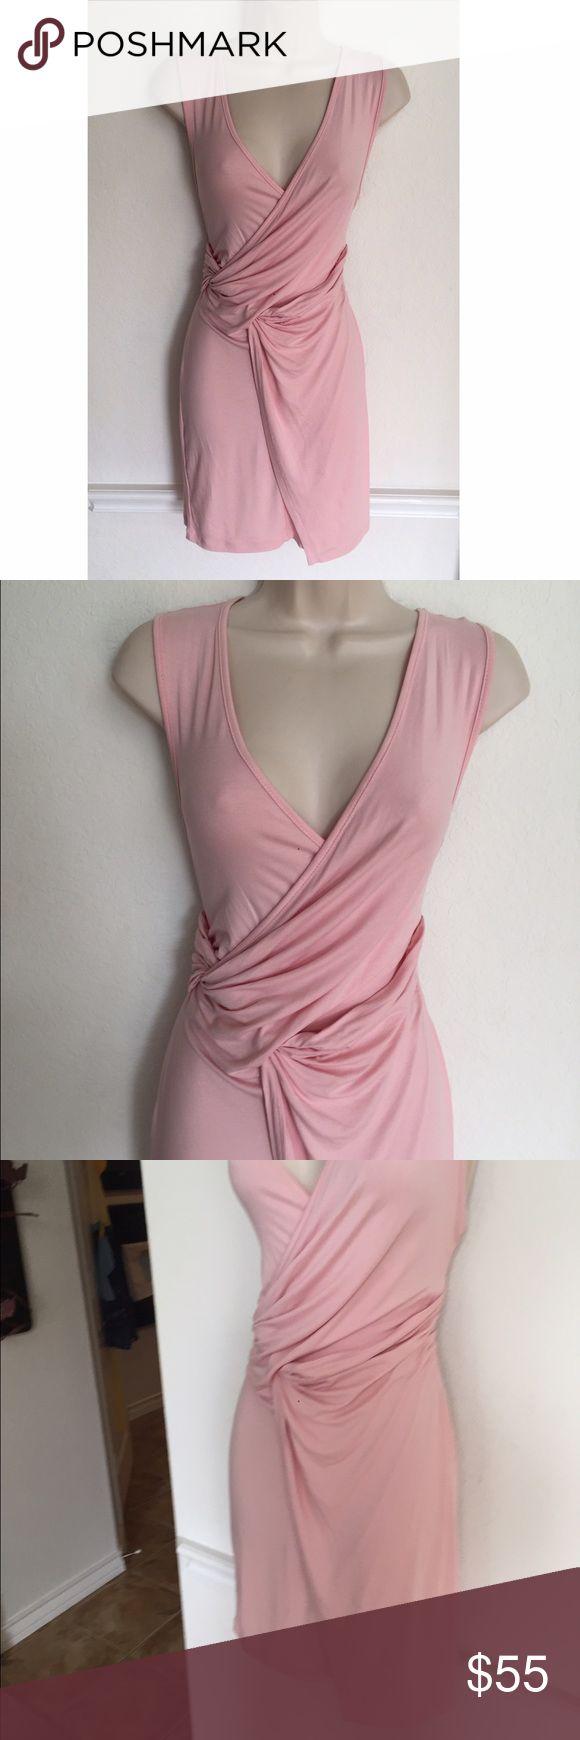 NWT Asos Petite Light Pink Faux Wrap Dress New with tags ASOS petite size 6 pale pink Faux Wrap Dress ASOS Petite Dresses Mini